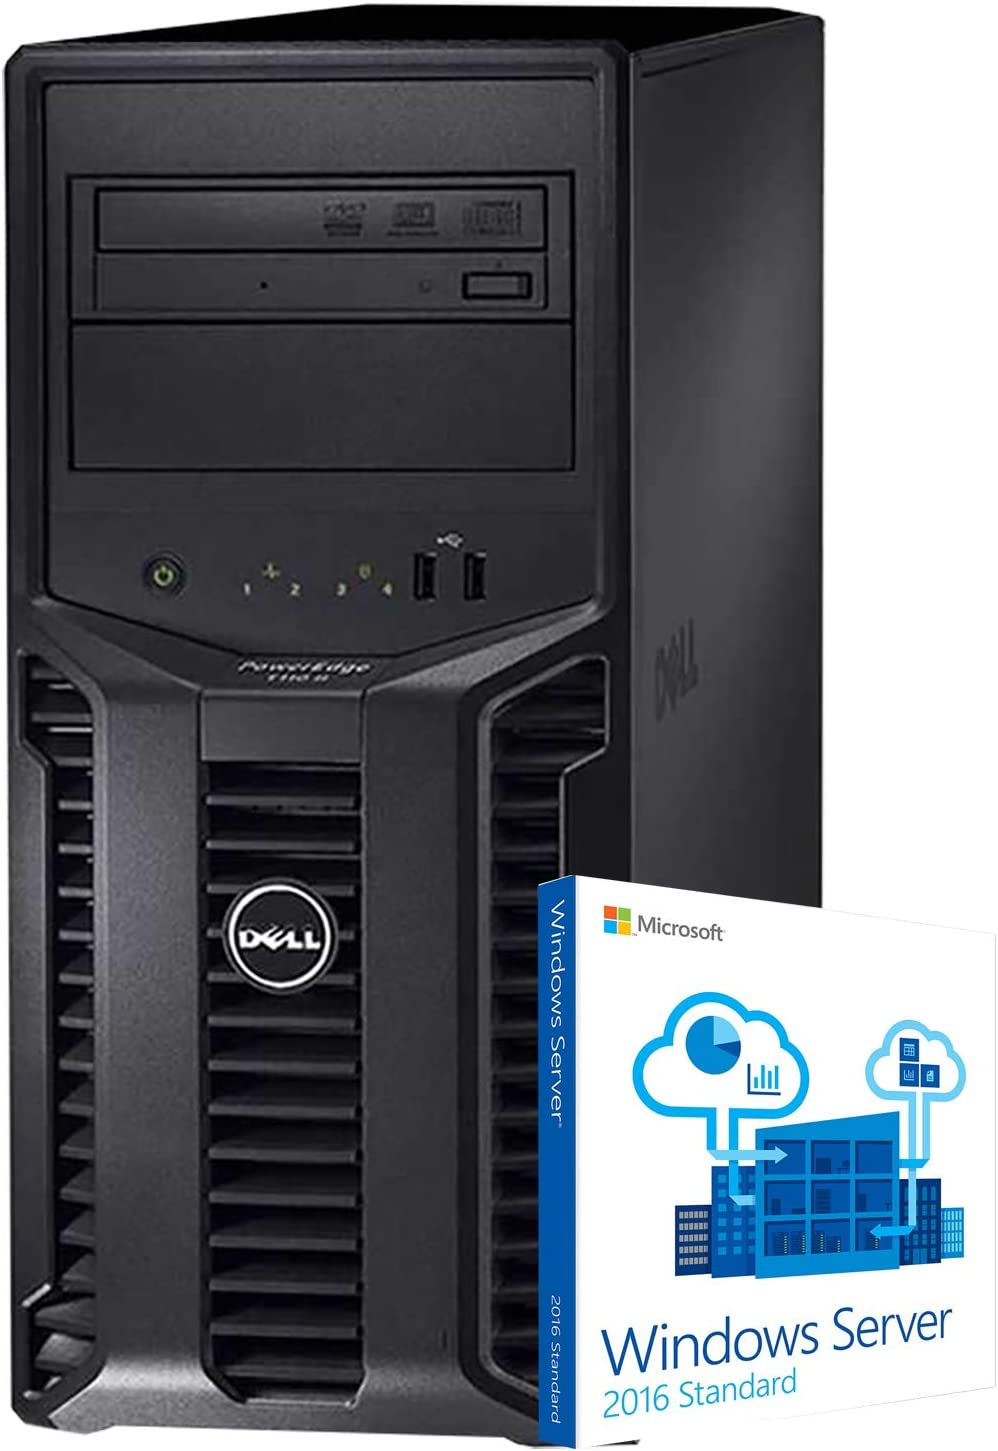 Dell PowerEdge T110 II Tower Server, Xeon E3-1220, 32GB DDR3, 8TB, PERC 6i RAID, DVD-ROM, Windows Server 2016 (Renewed)